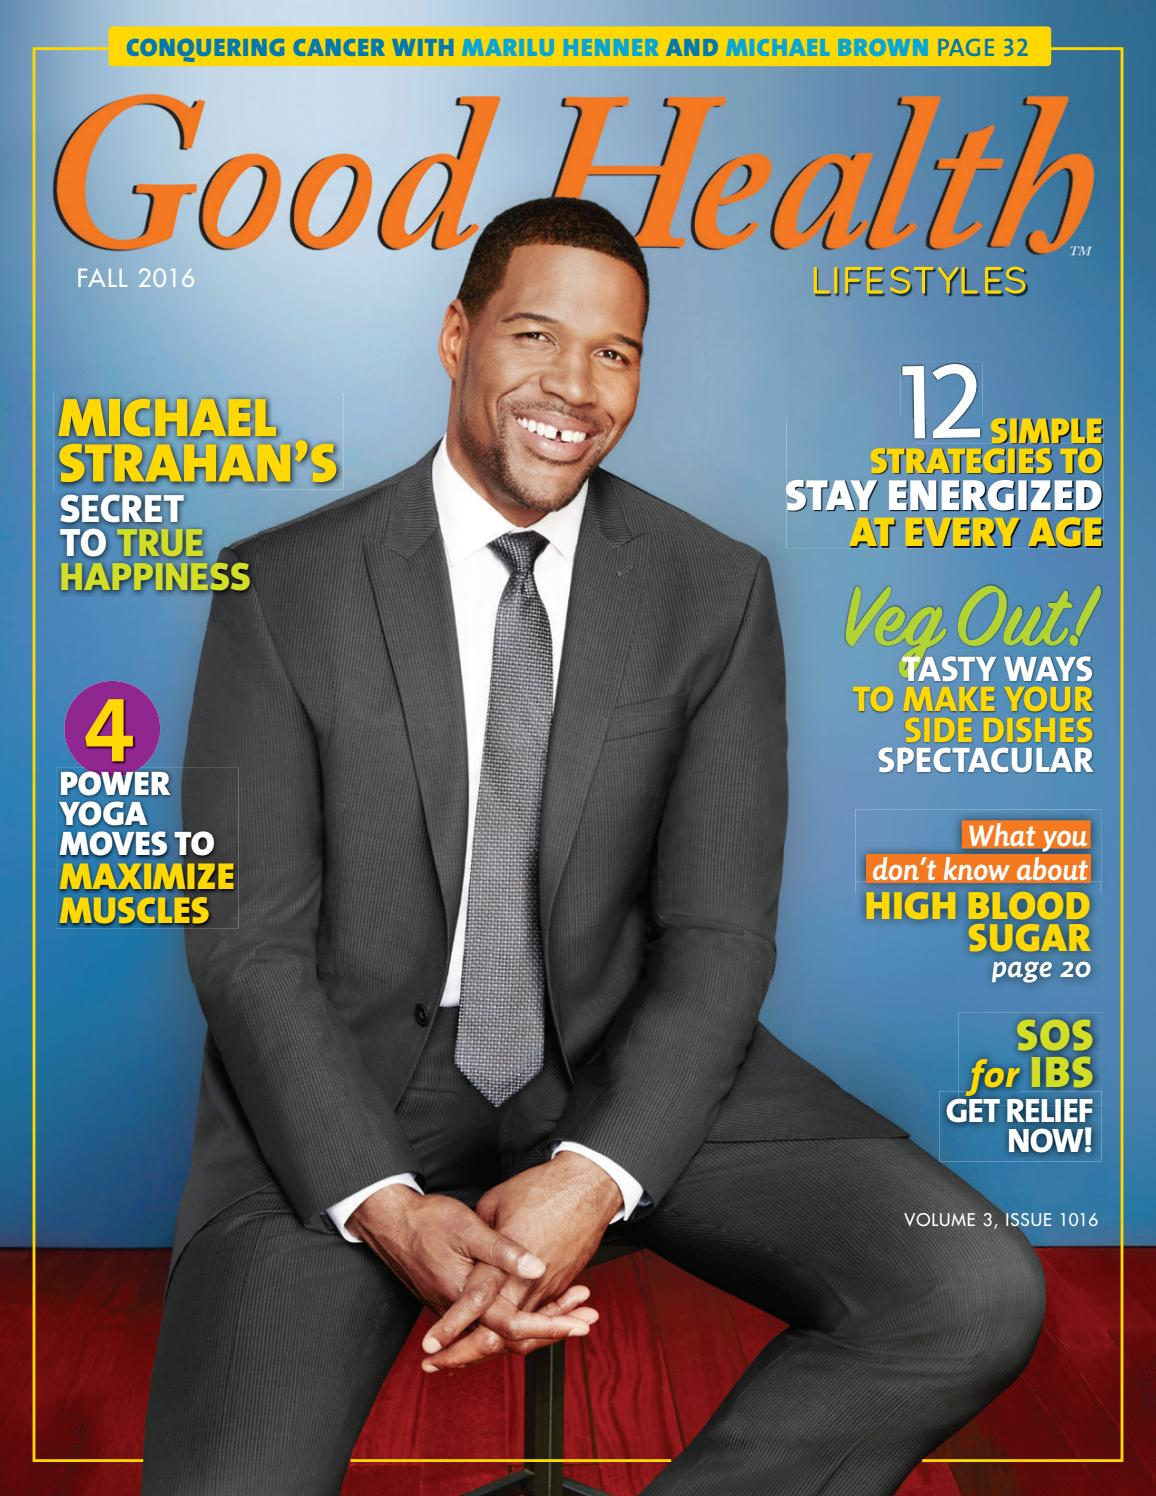 Good Health Lifestyles - Oct. 2016 by Good Health Lifestyles - issuu